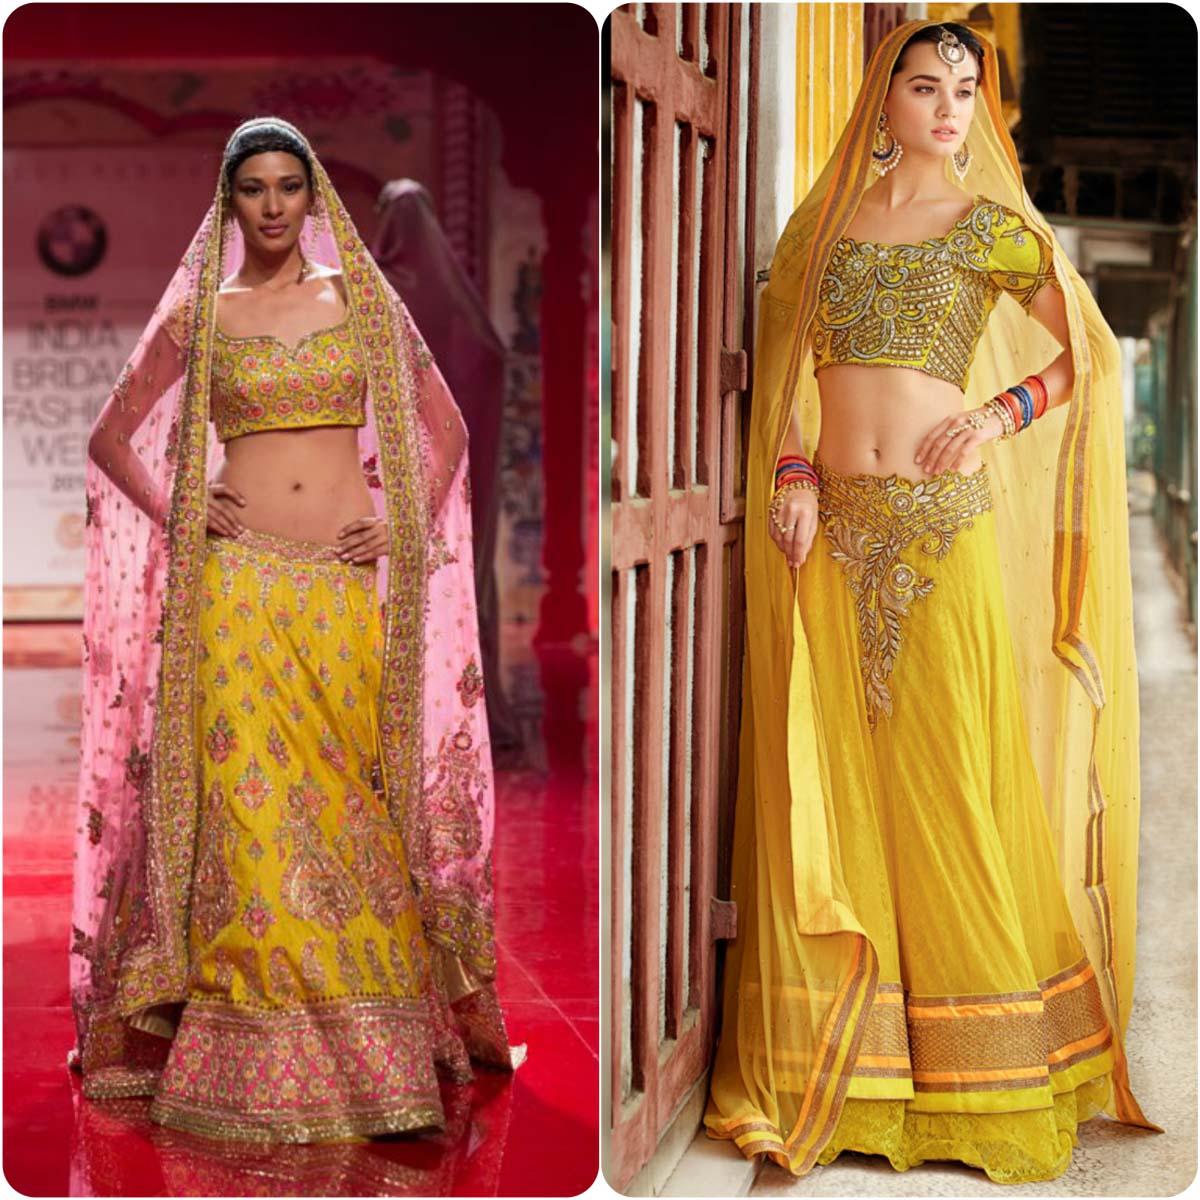 Beautiful Yellow Mehndi Dresses for Wedding Brides 2016-2017 (7)